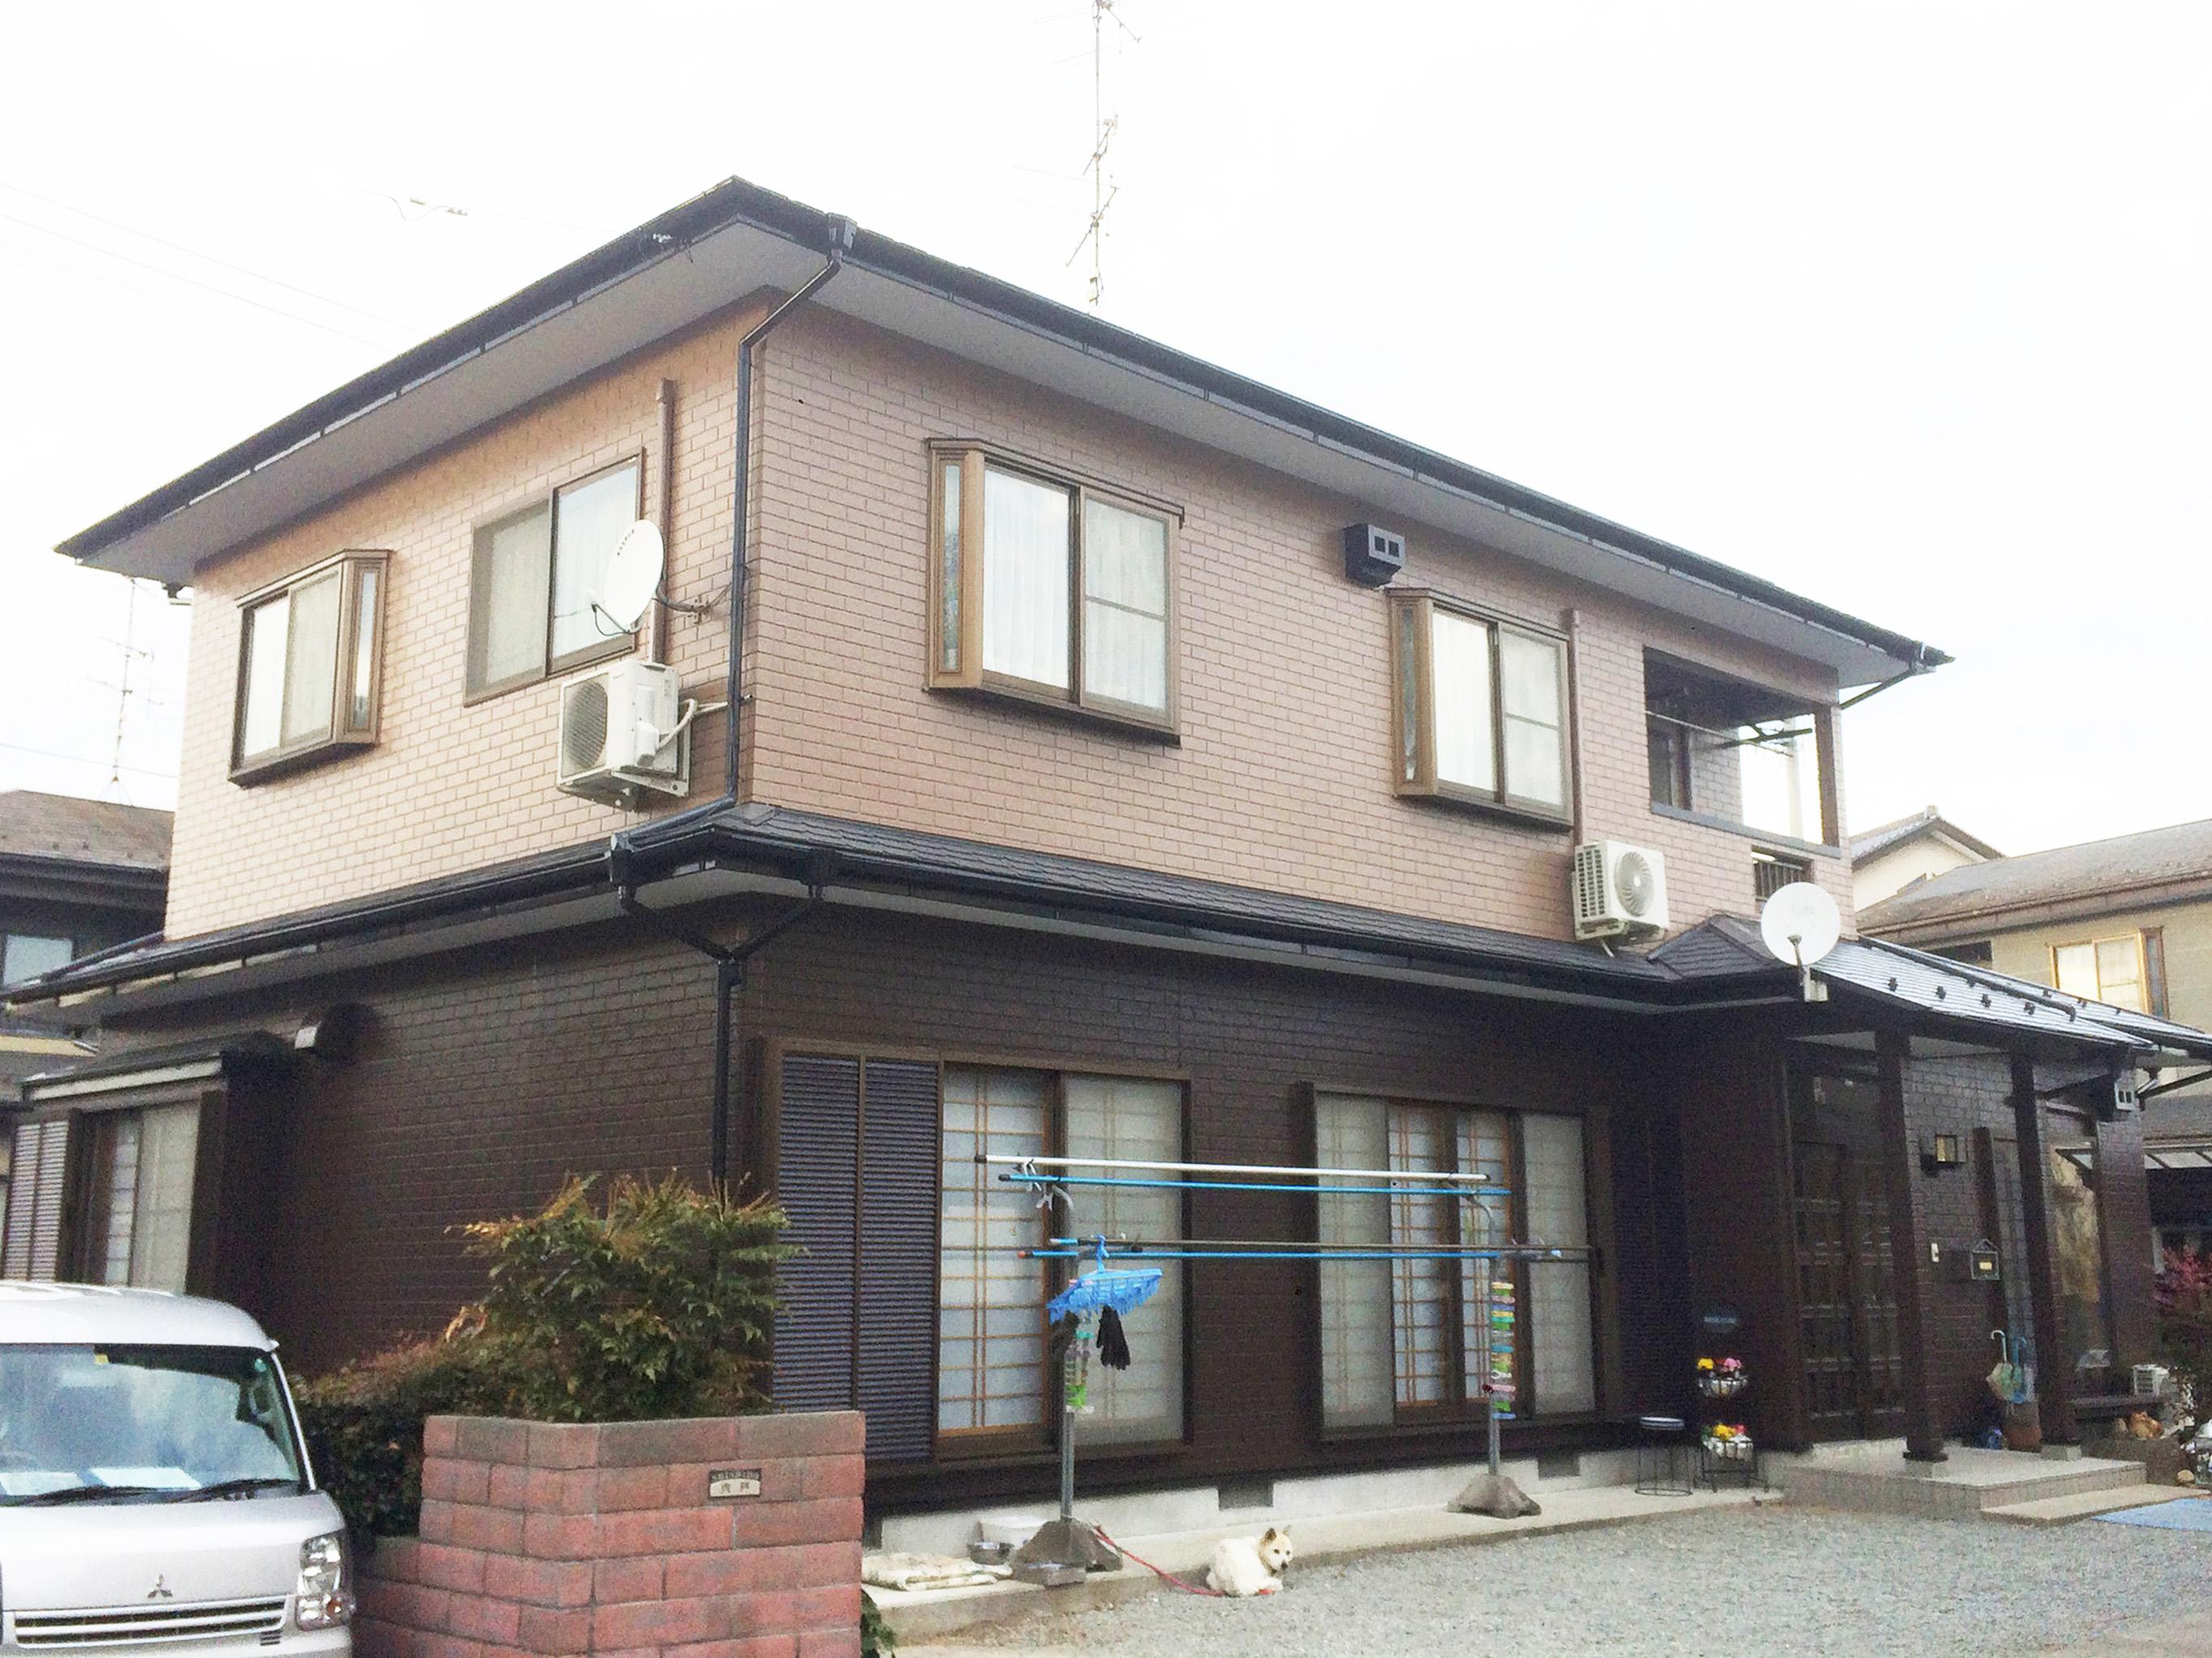 福島県S邸 外壁塗装・外装リフォーム 144万円/工期20日間 施工後